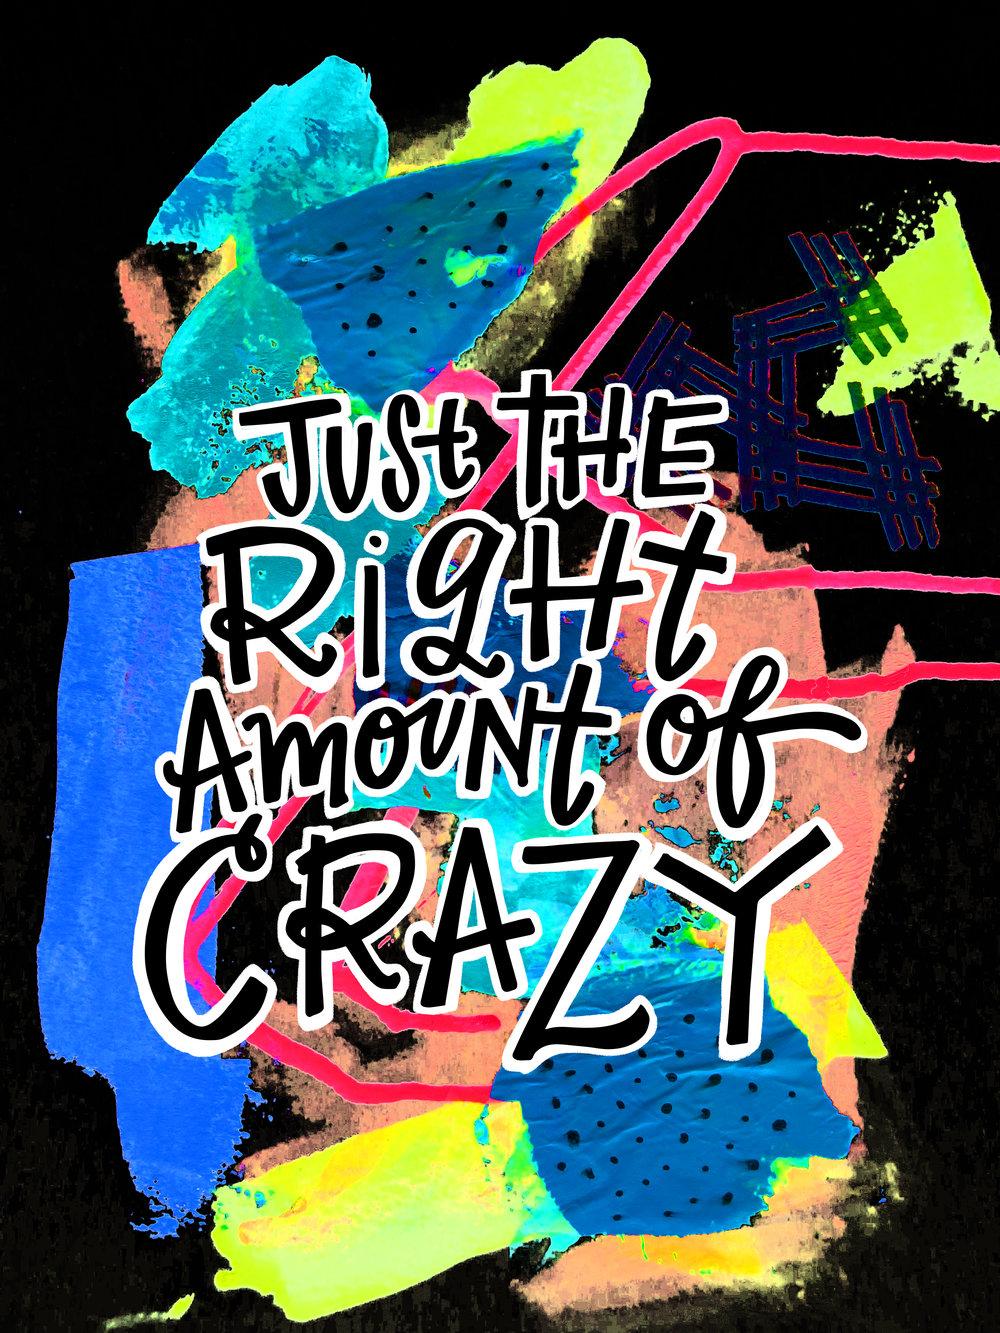 7/28/16: Crazy